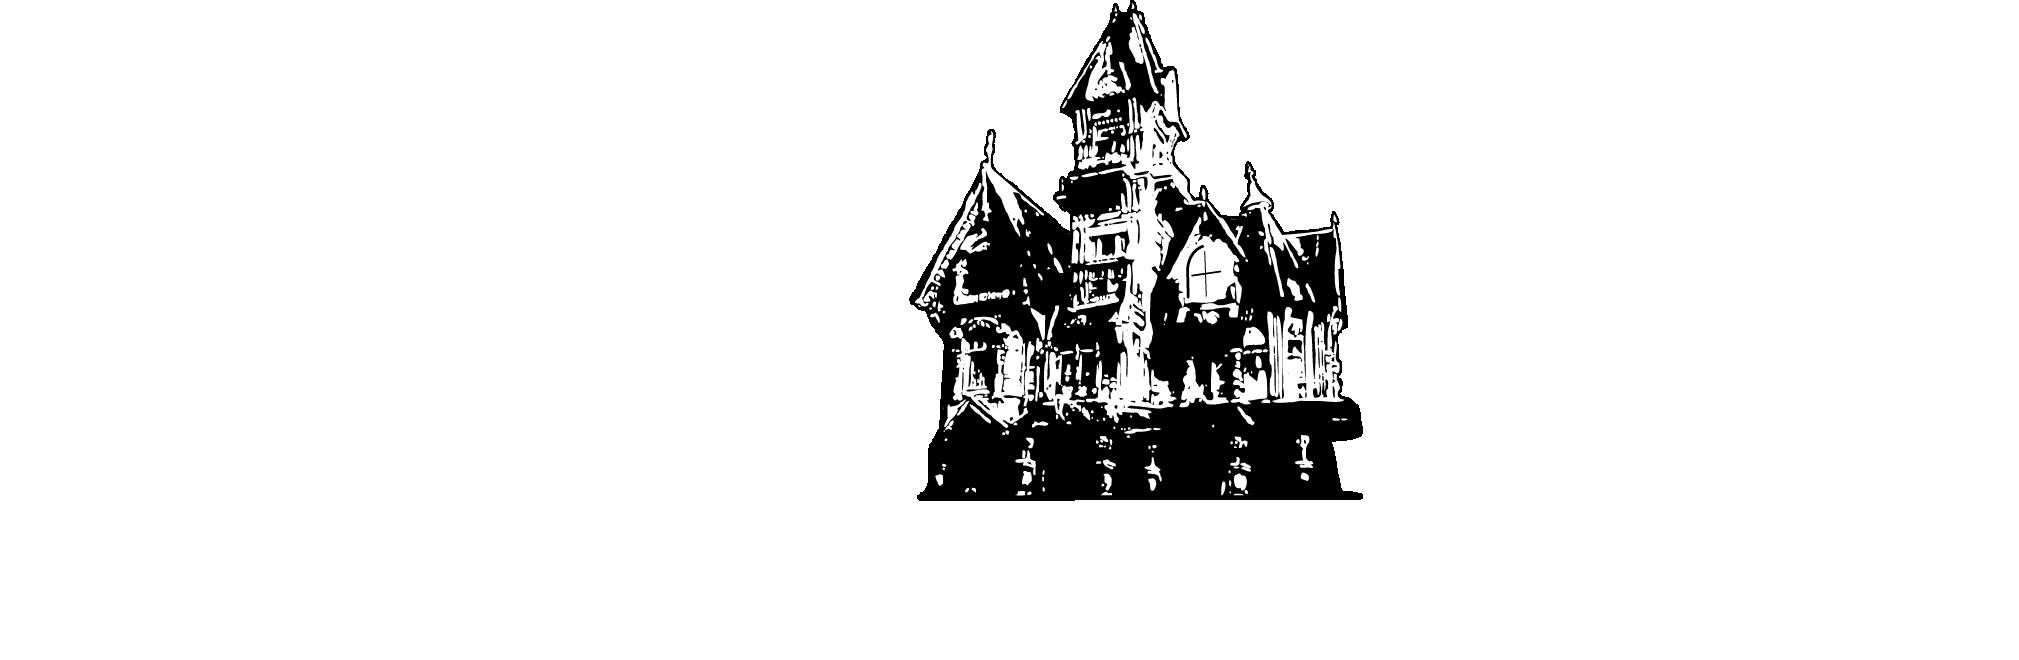 Haunted_House_logo_white_on_black.png